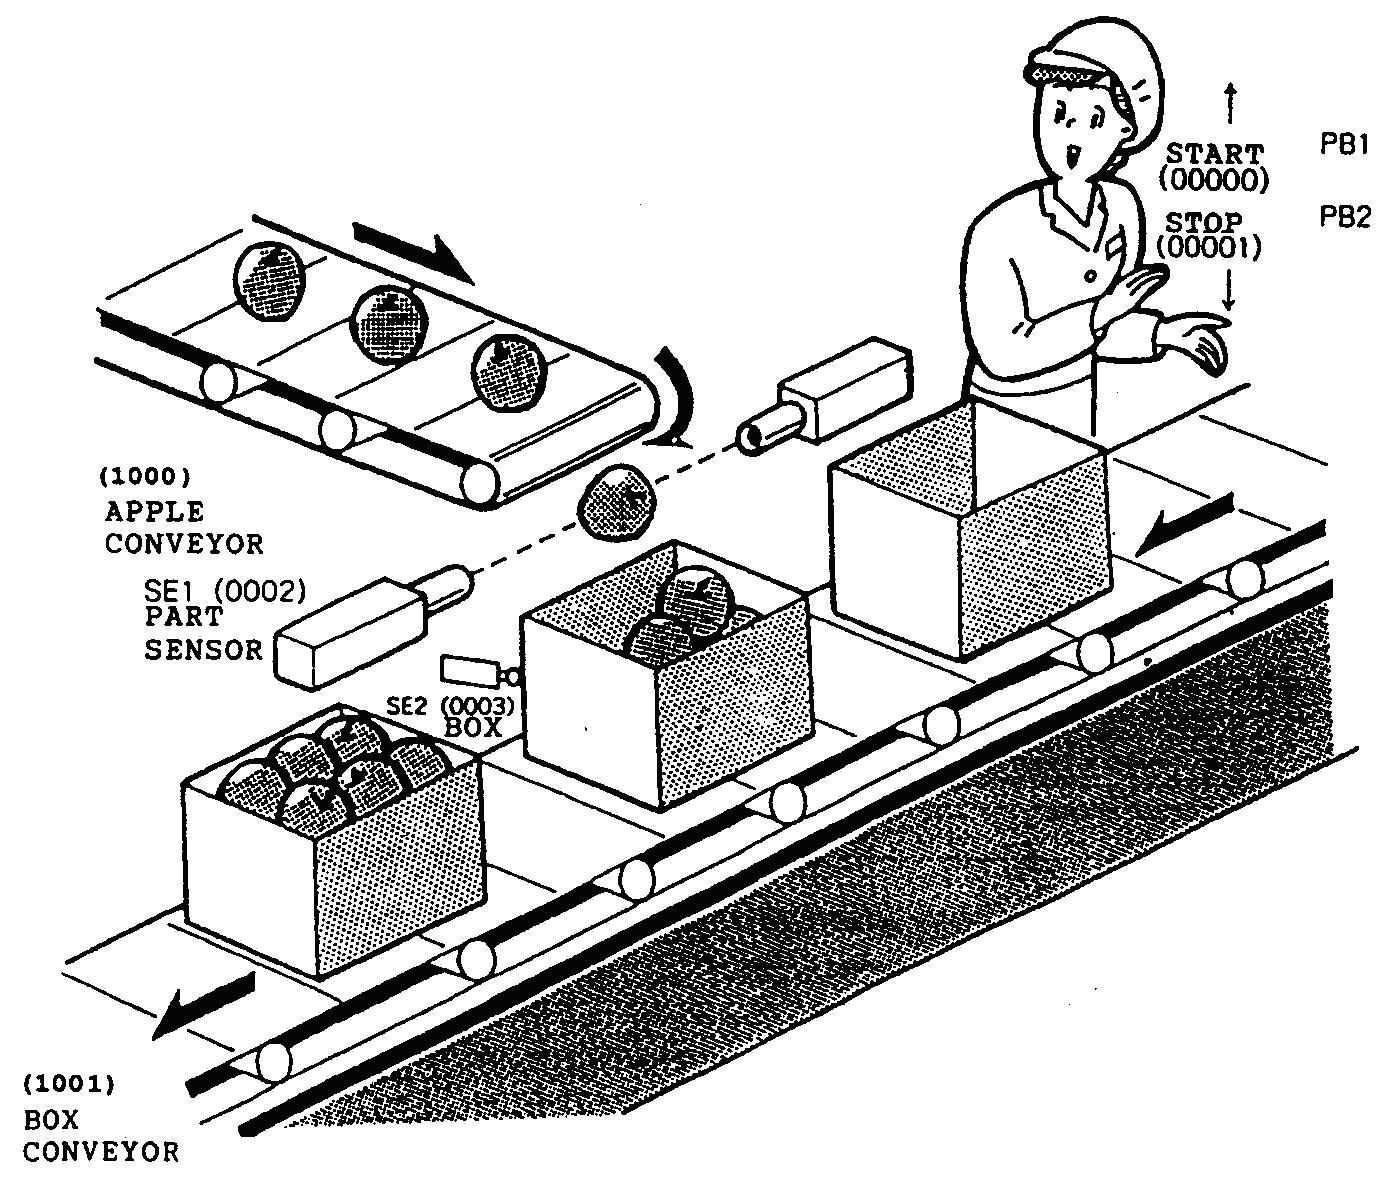 Belajar Teknik Elektro Robotika Pemrograman Teknologi